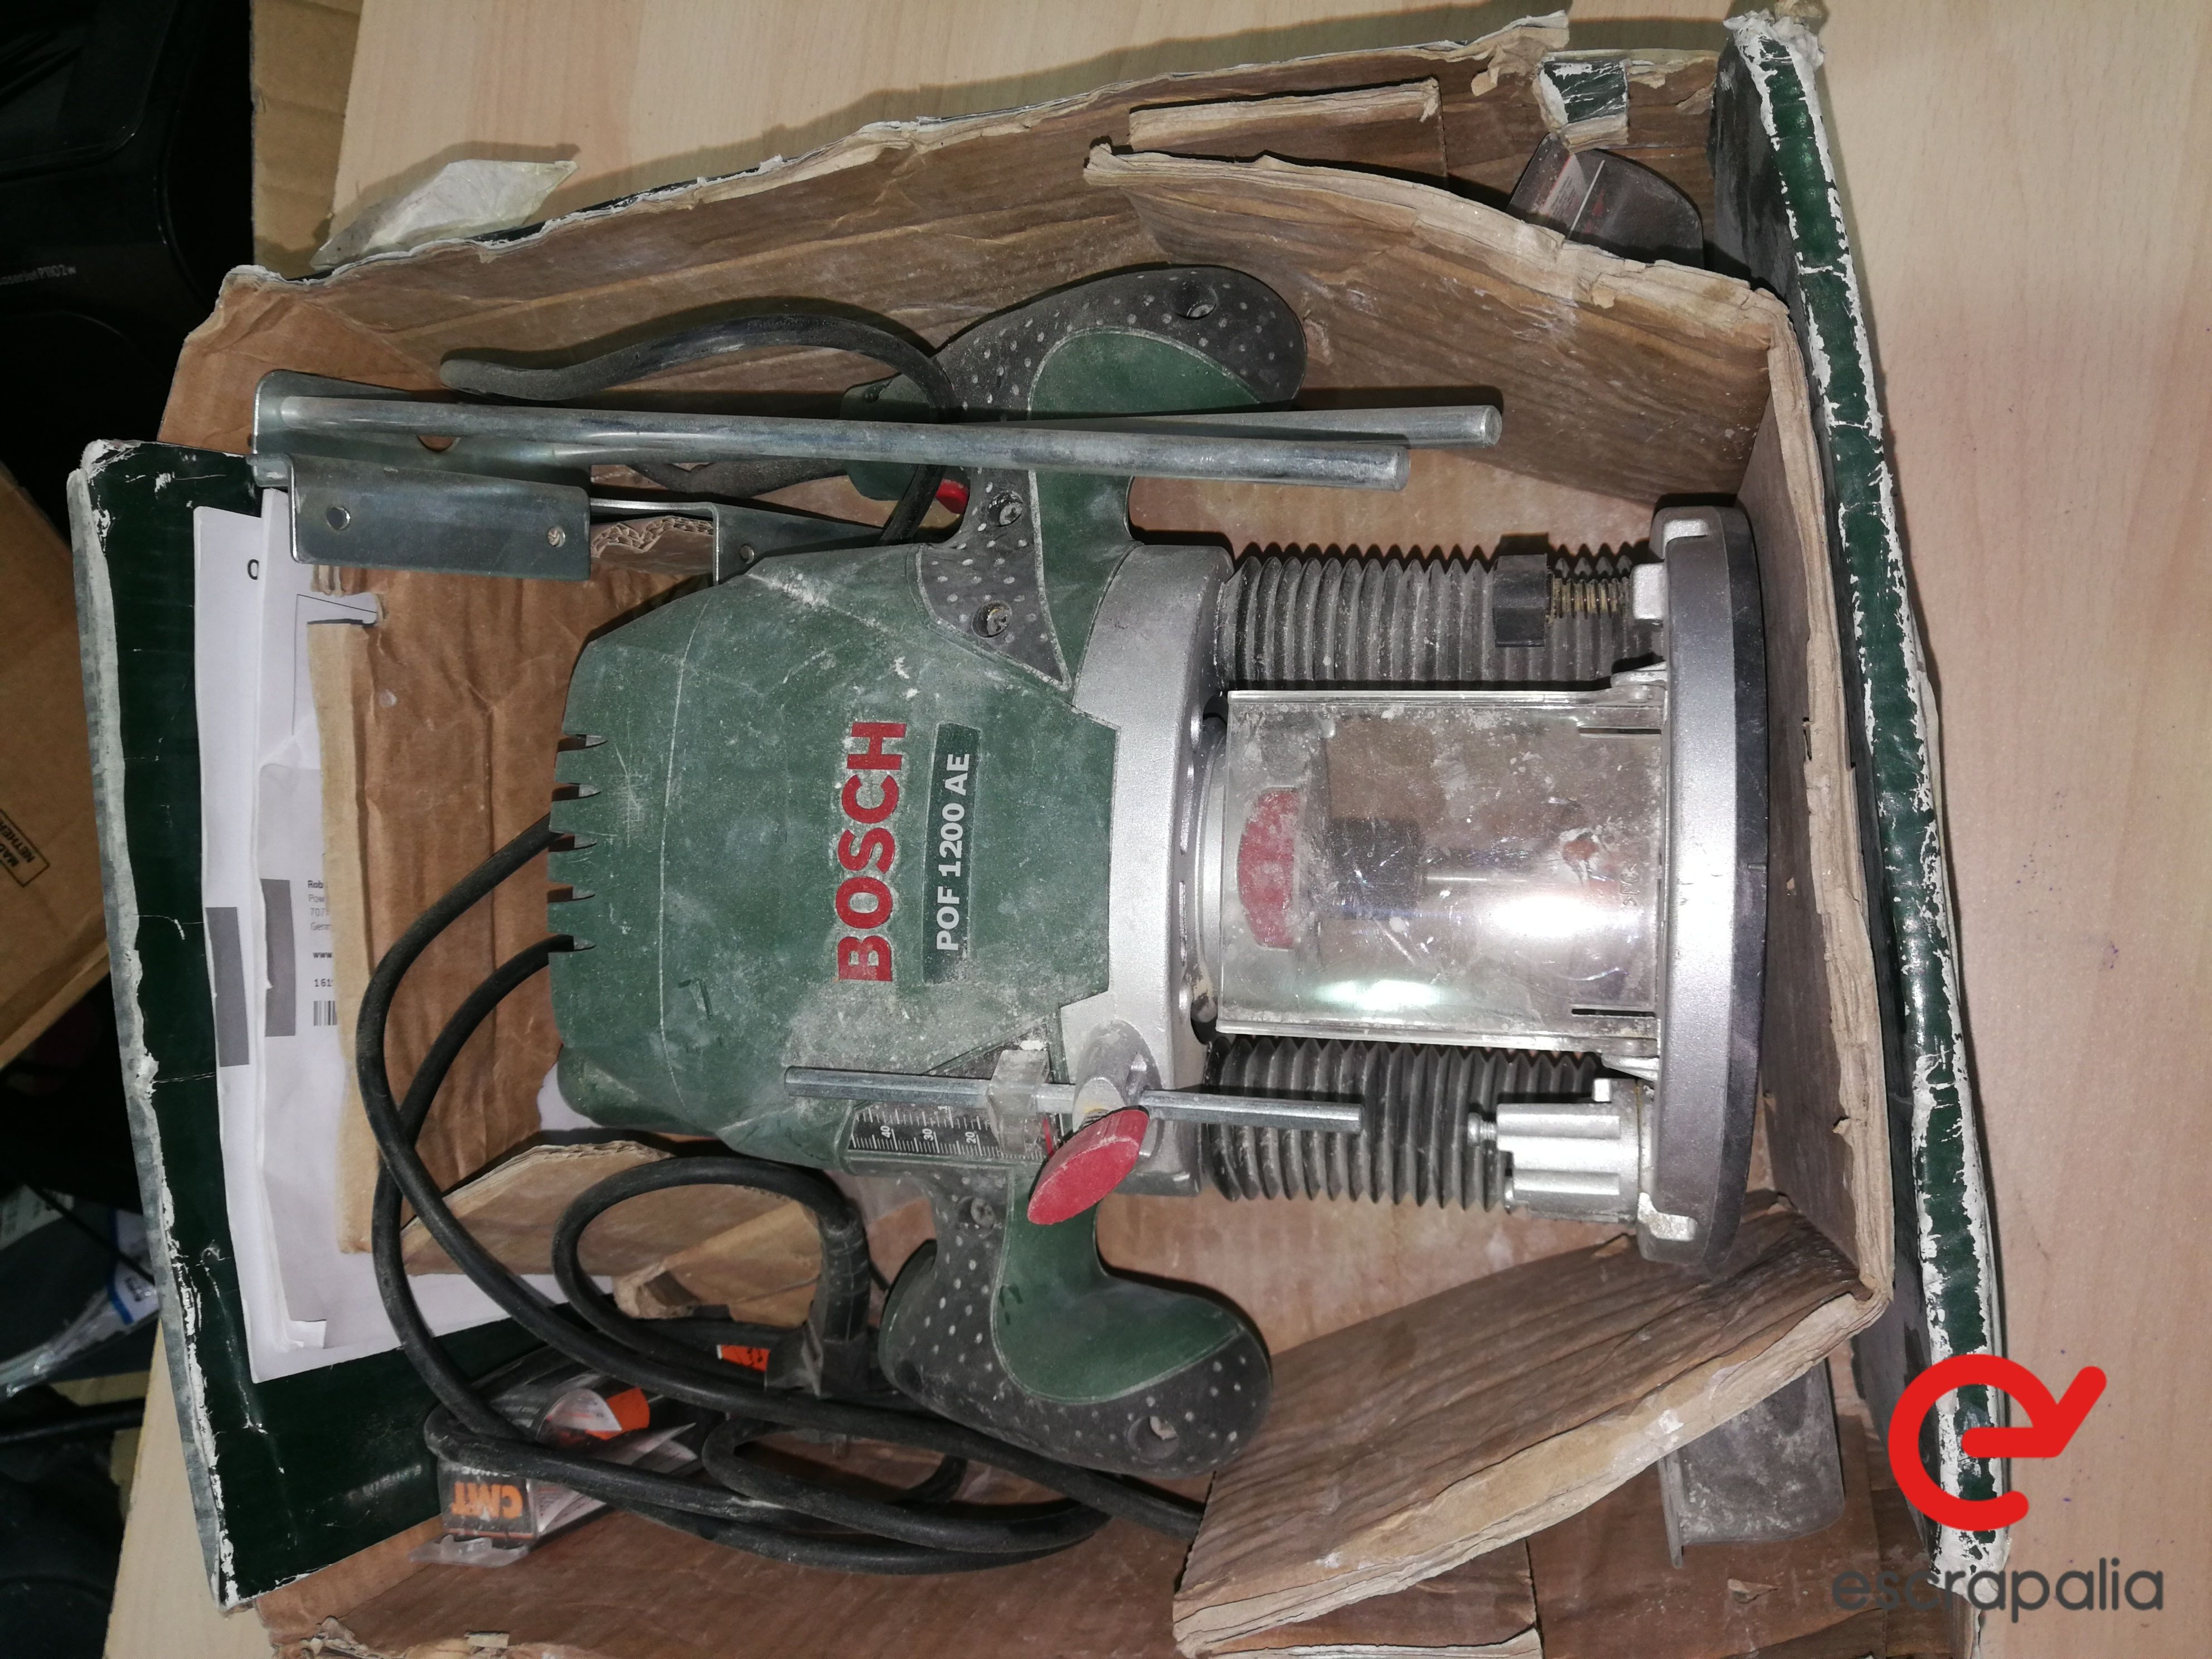 Bosch-Planfräsmaschine Modell POF 1200 AE. Lot 046